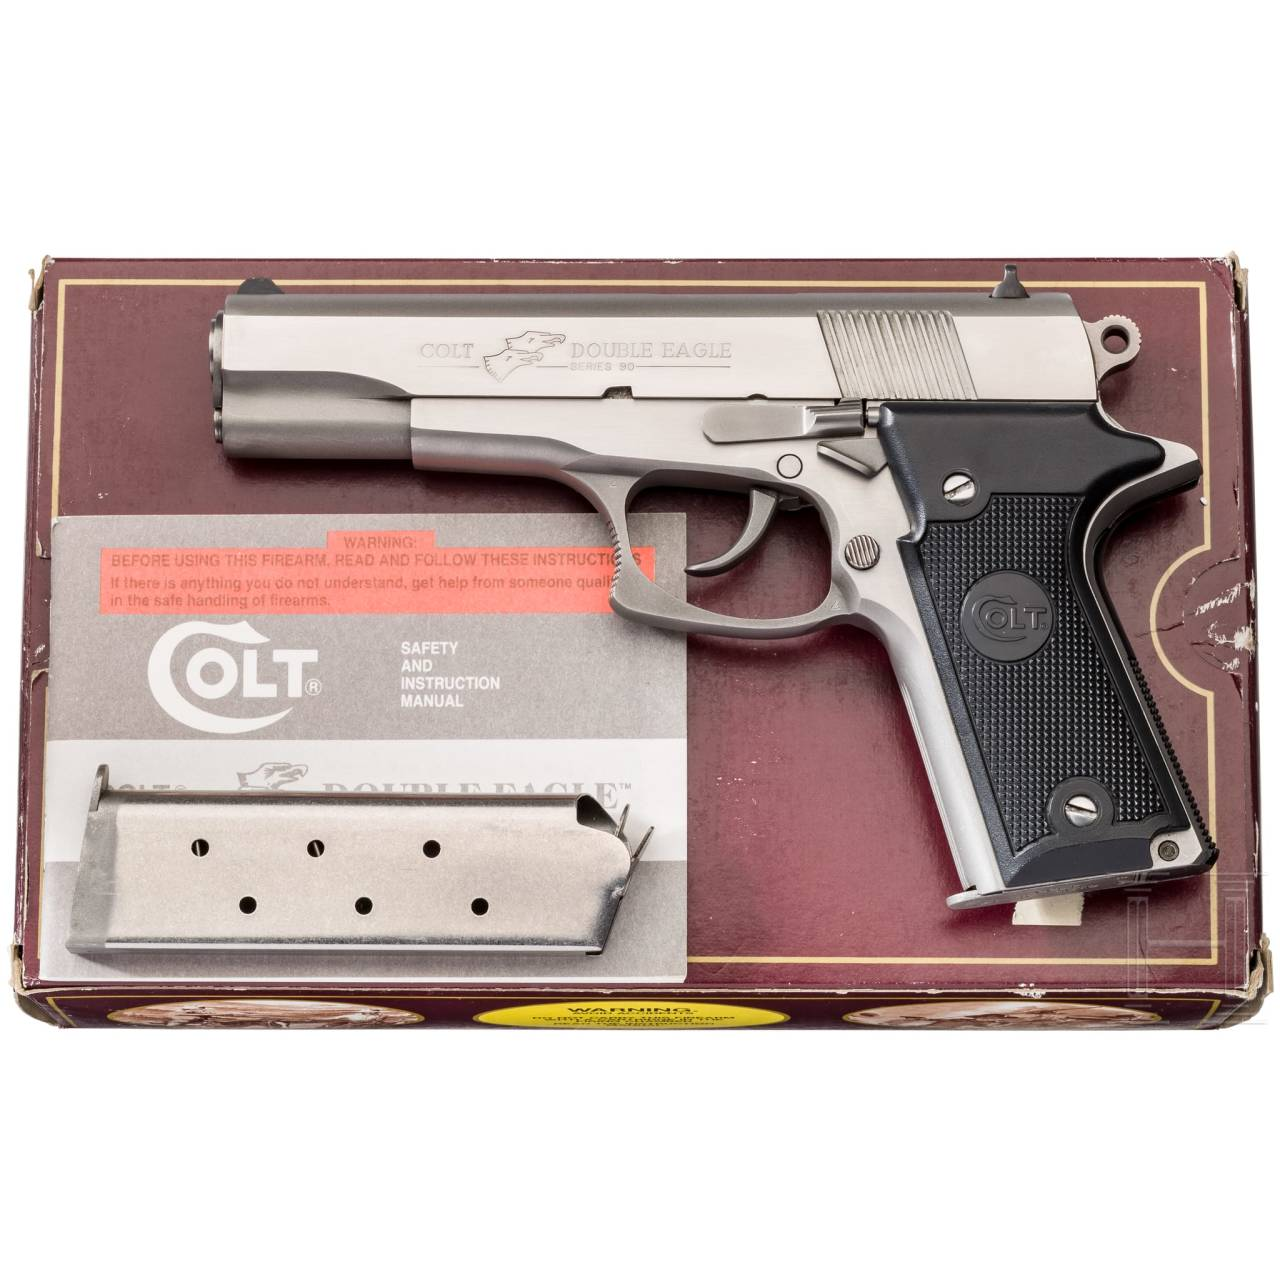 Colt Double Eagle Series 90 MK II, Stainless, im Karton